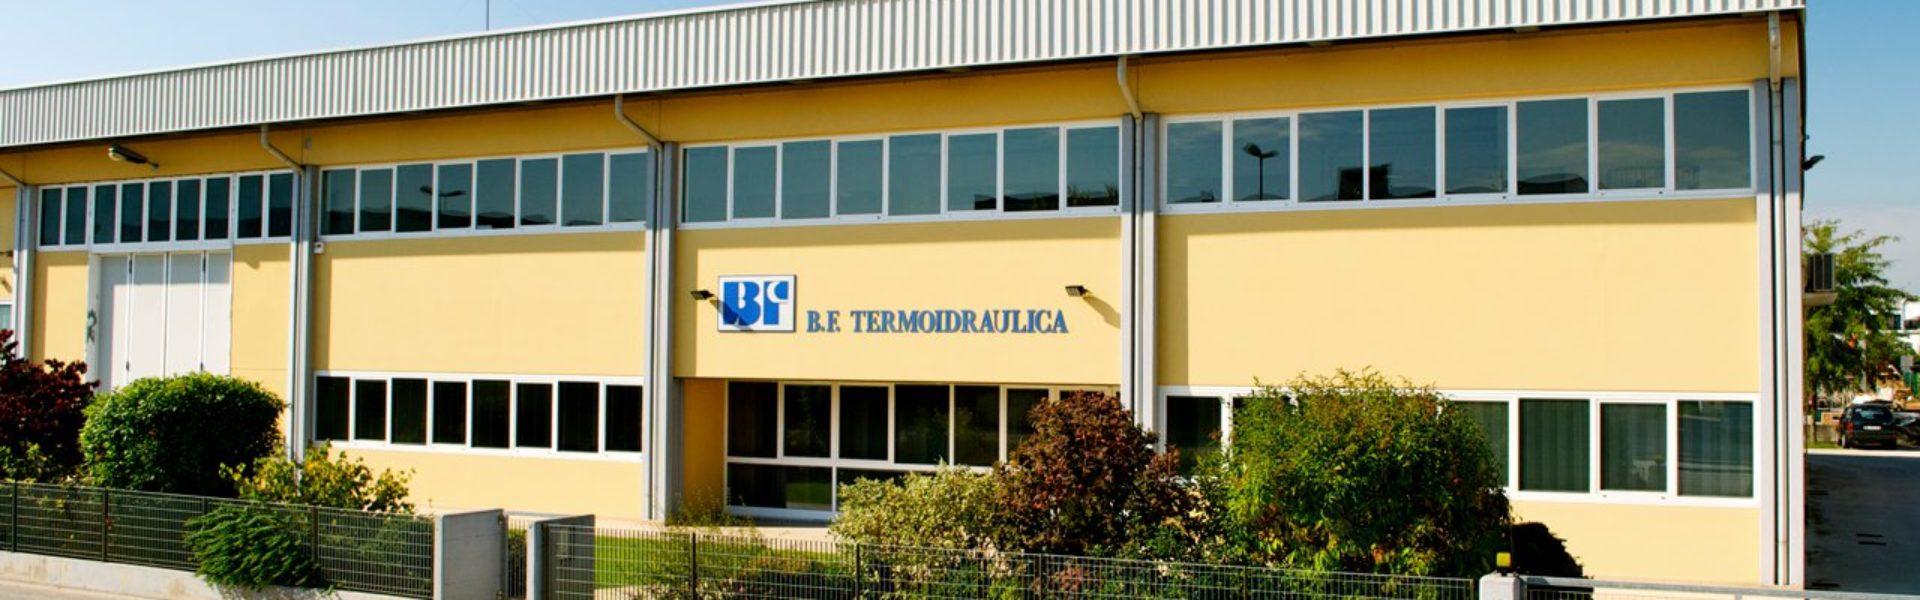 B.F. Termoidraulica Srl